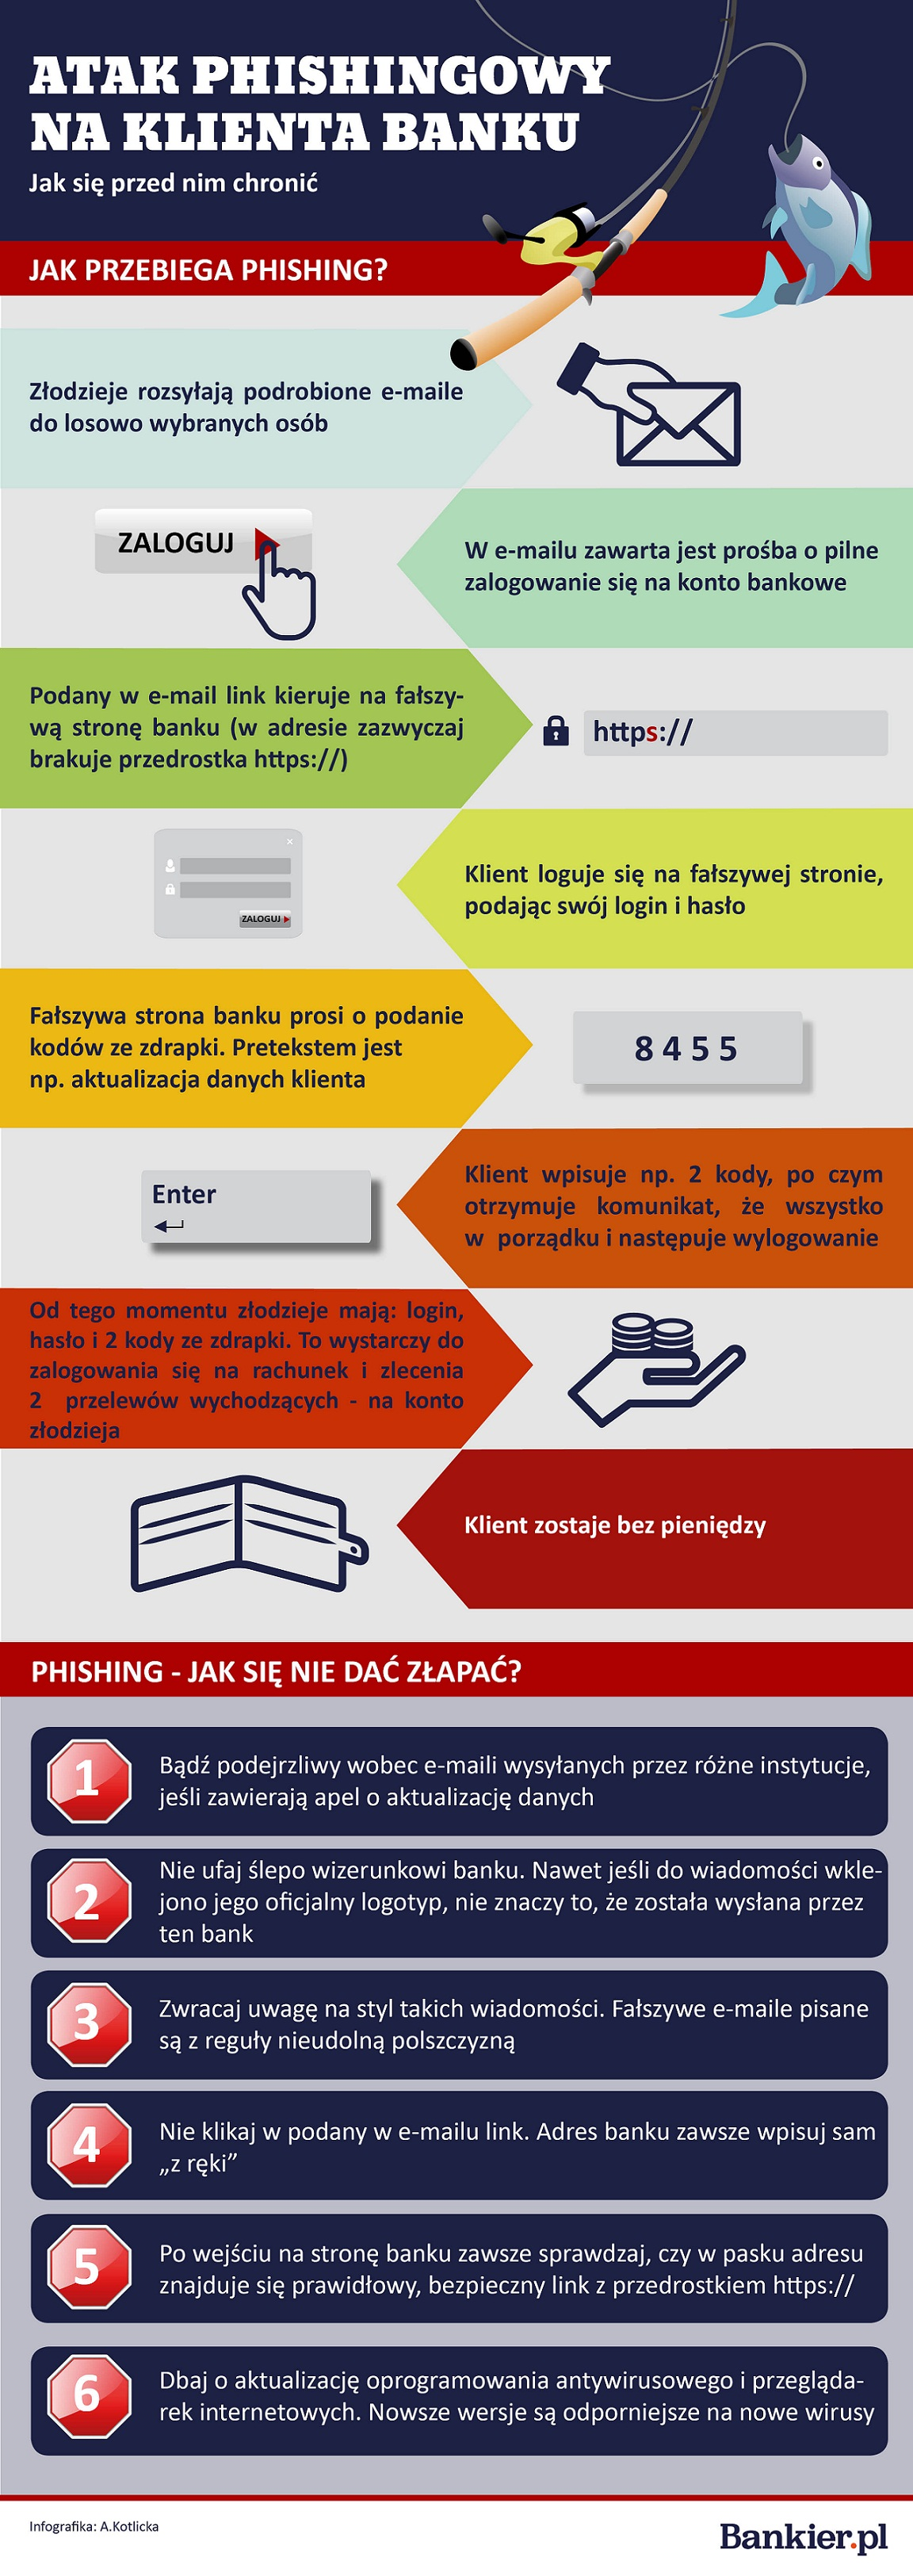 Atak phishingowy na klienta banku - infografika